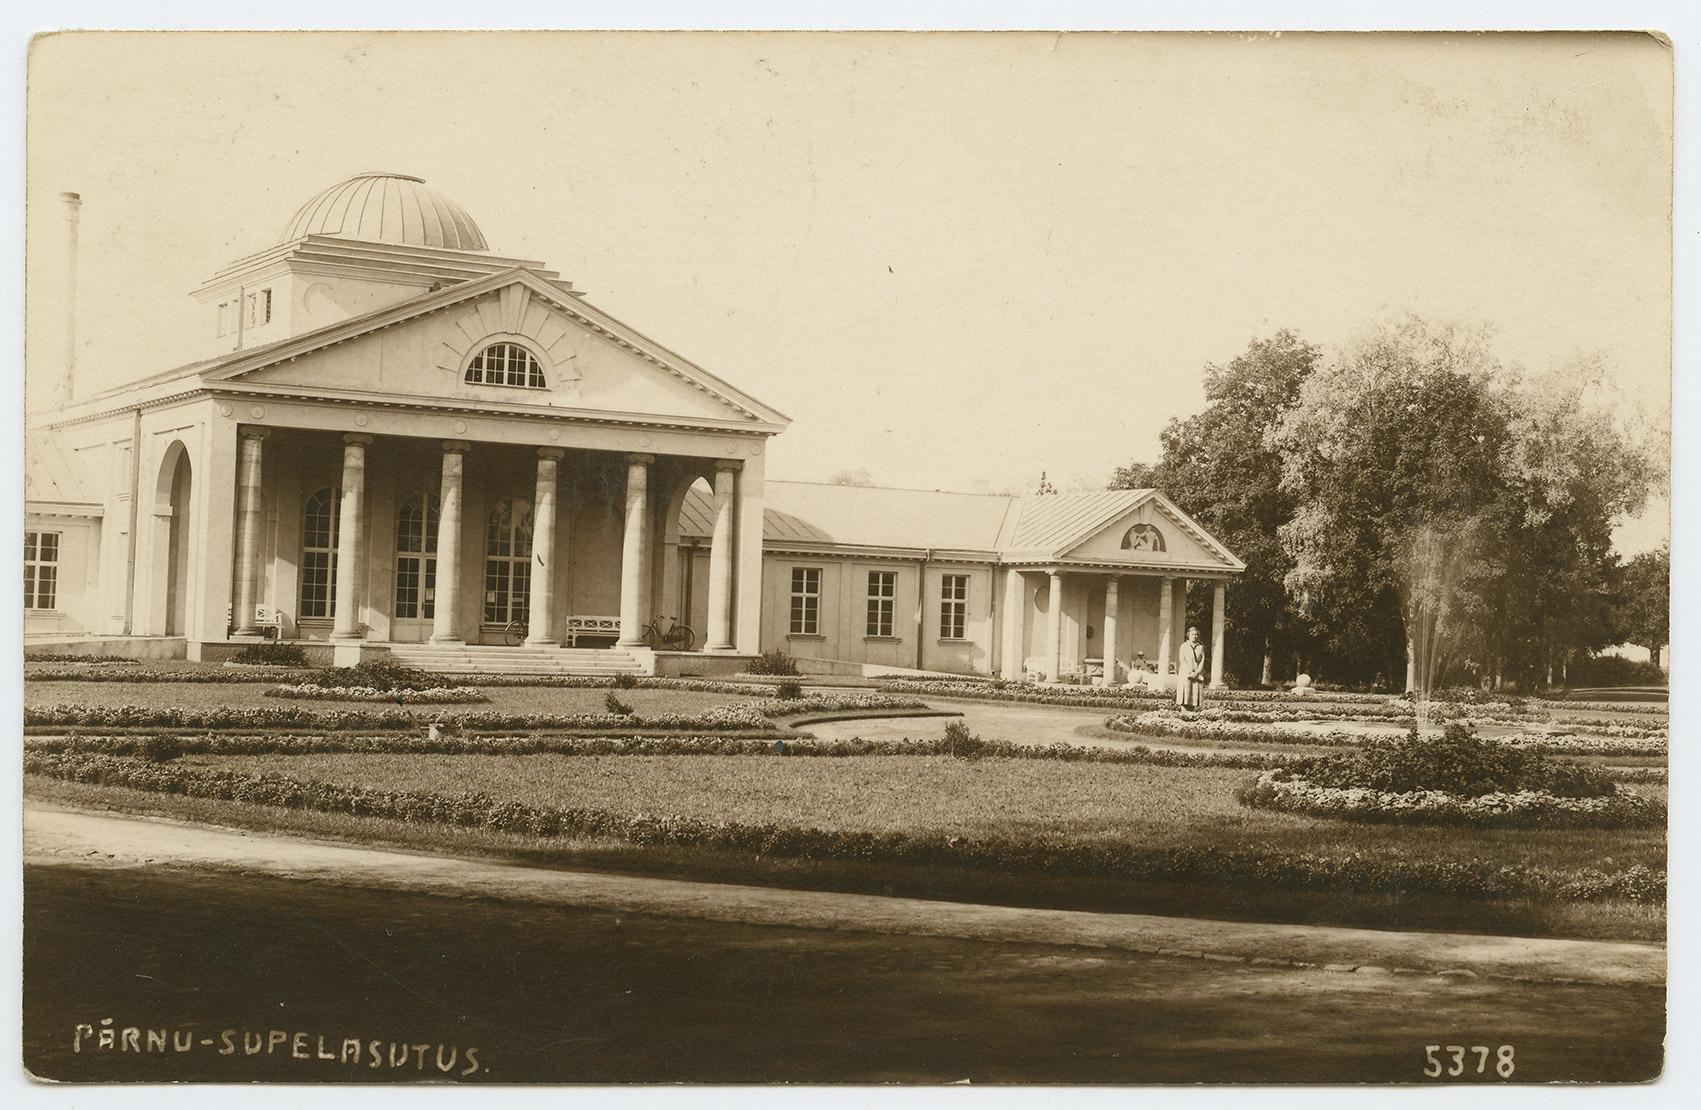 0446b-Hirmus-onnetus-lihtsal-postkaardil-parnu-paide-1929